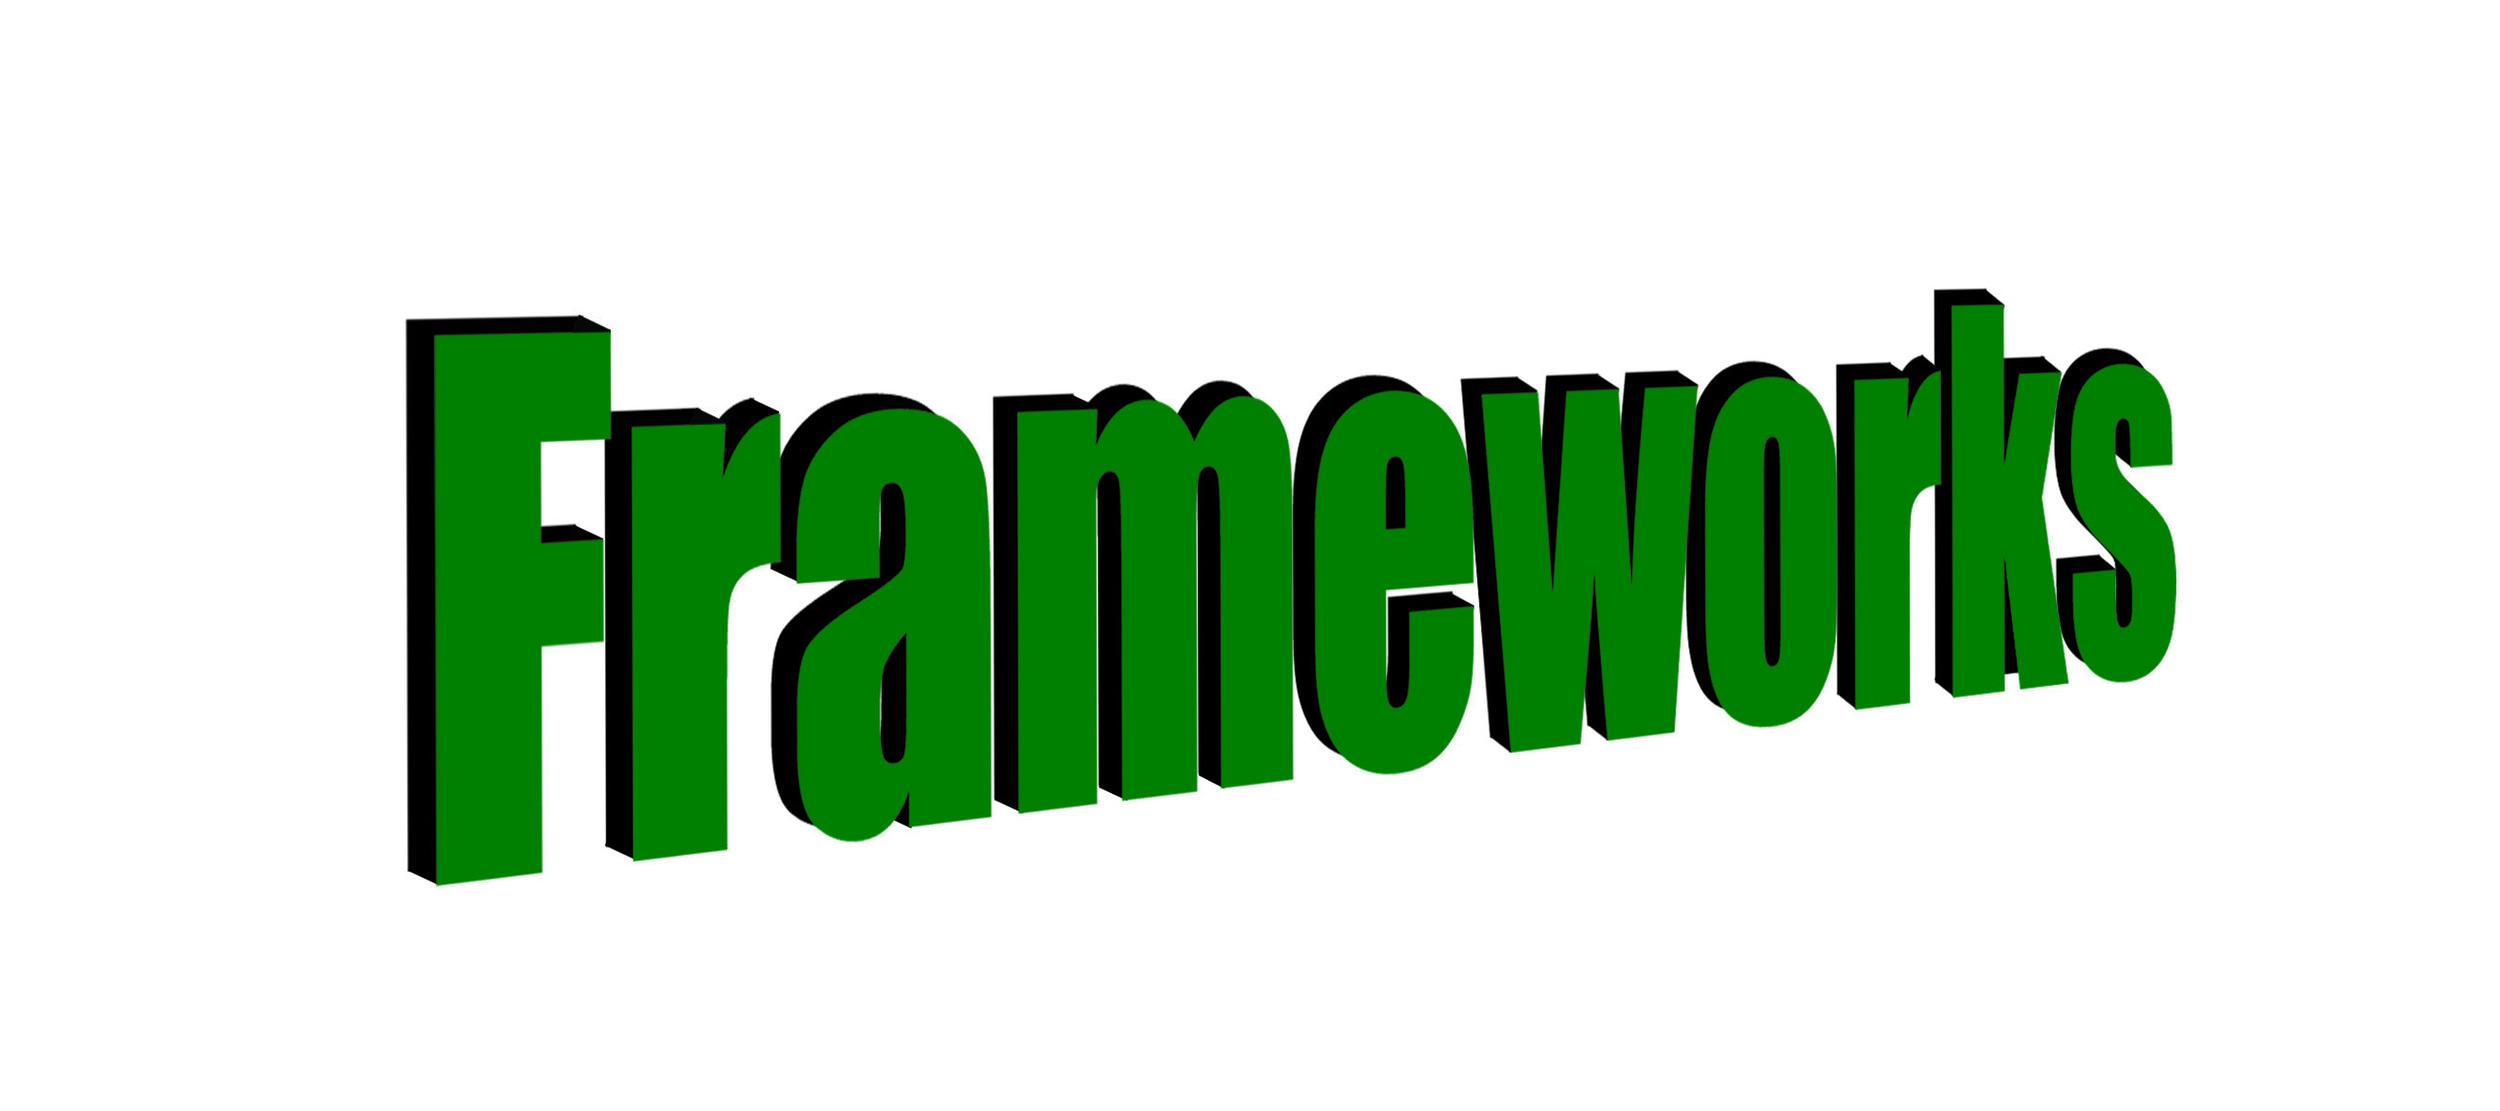 frameworks logo.jpg